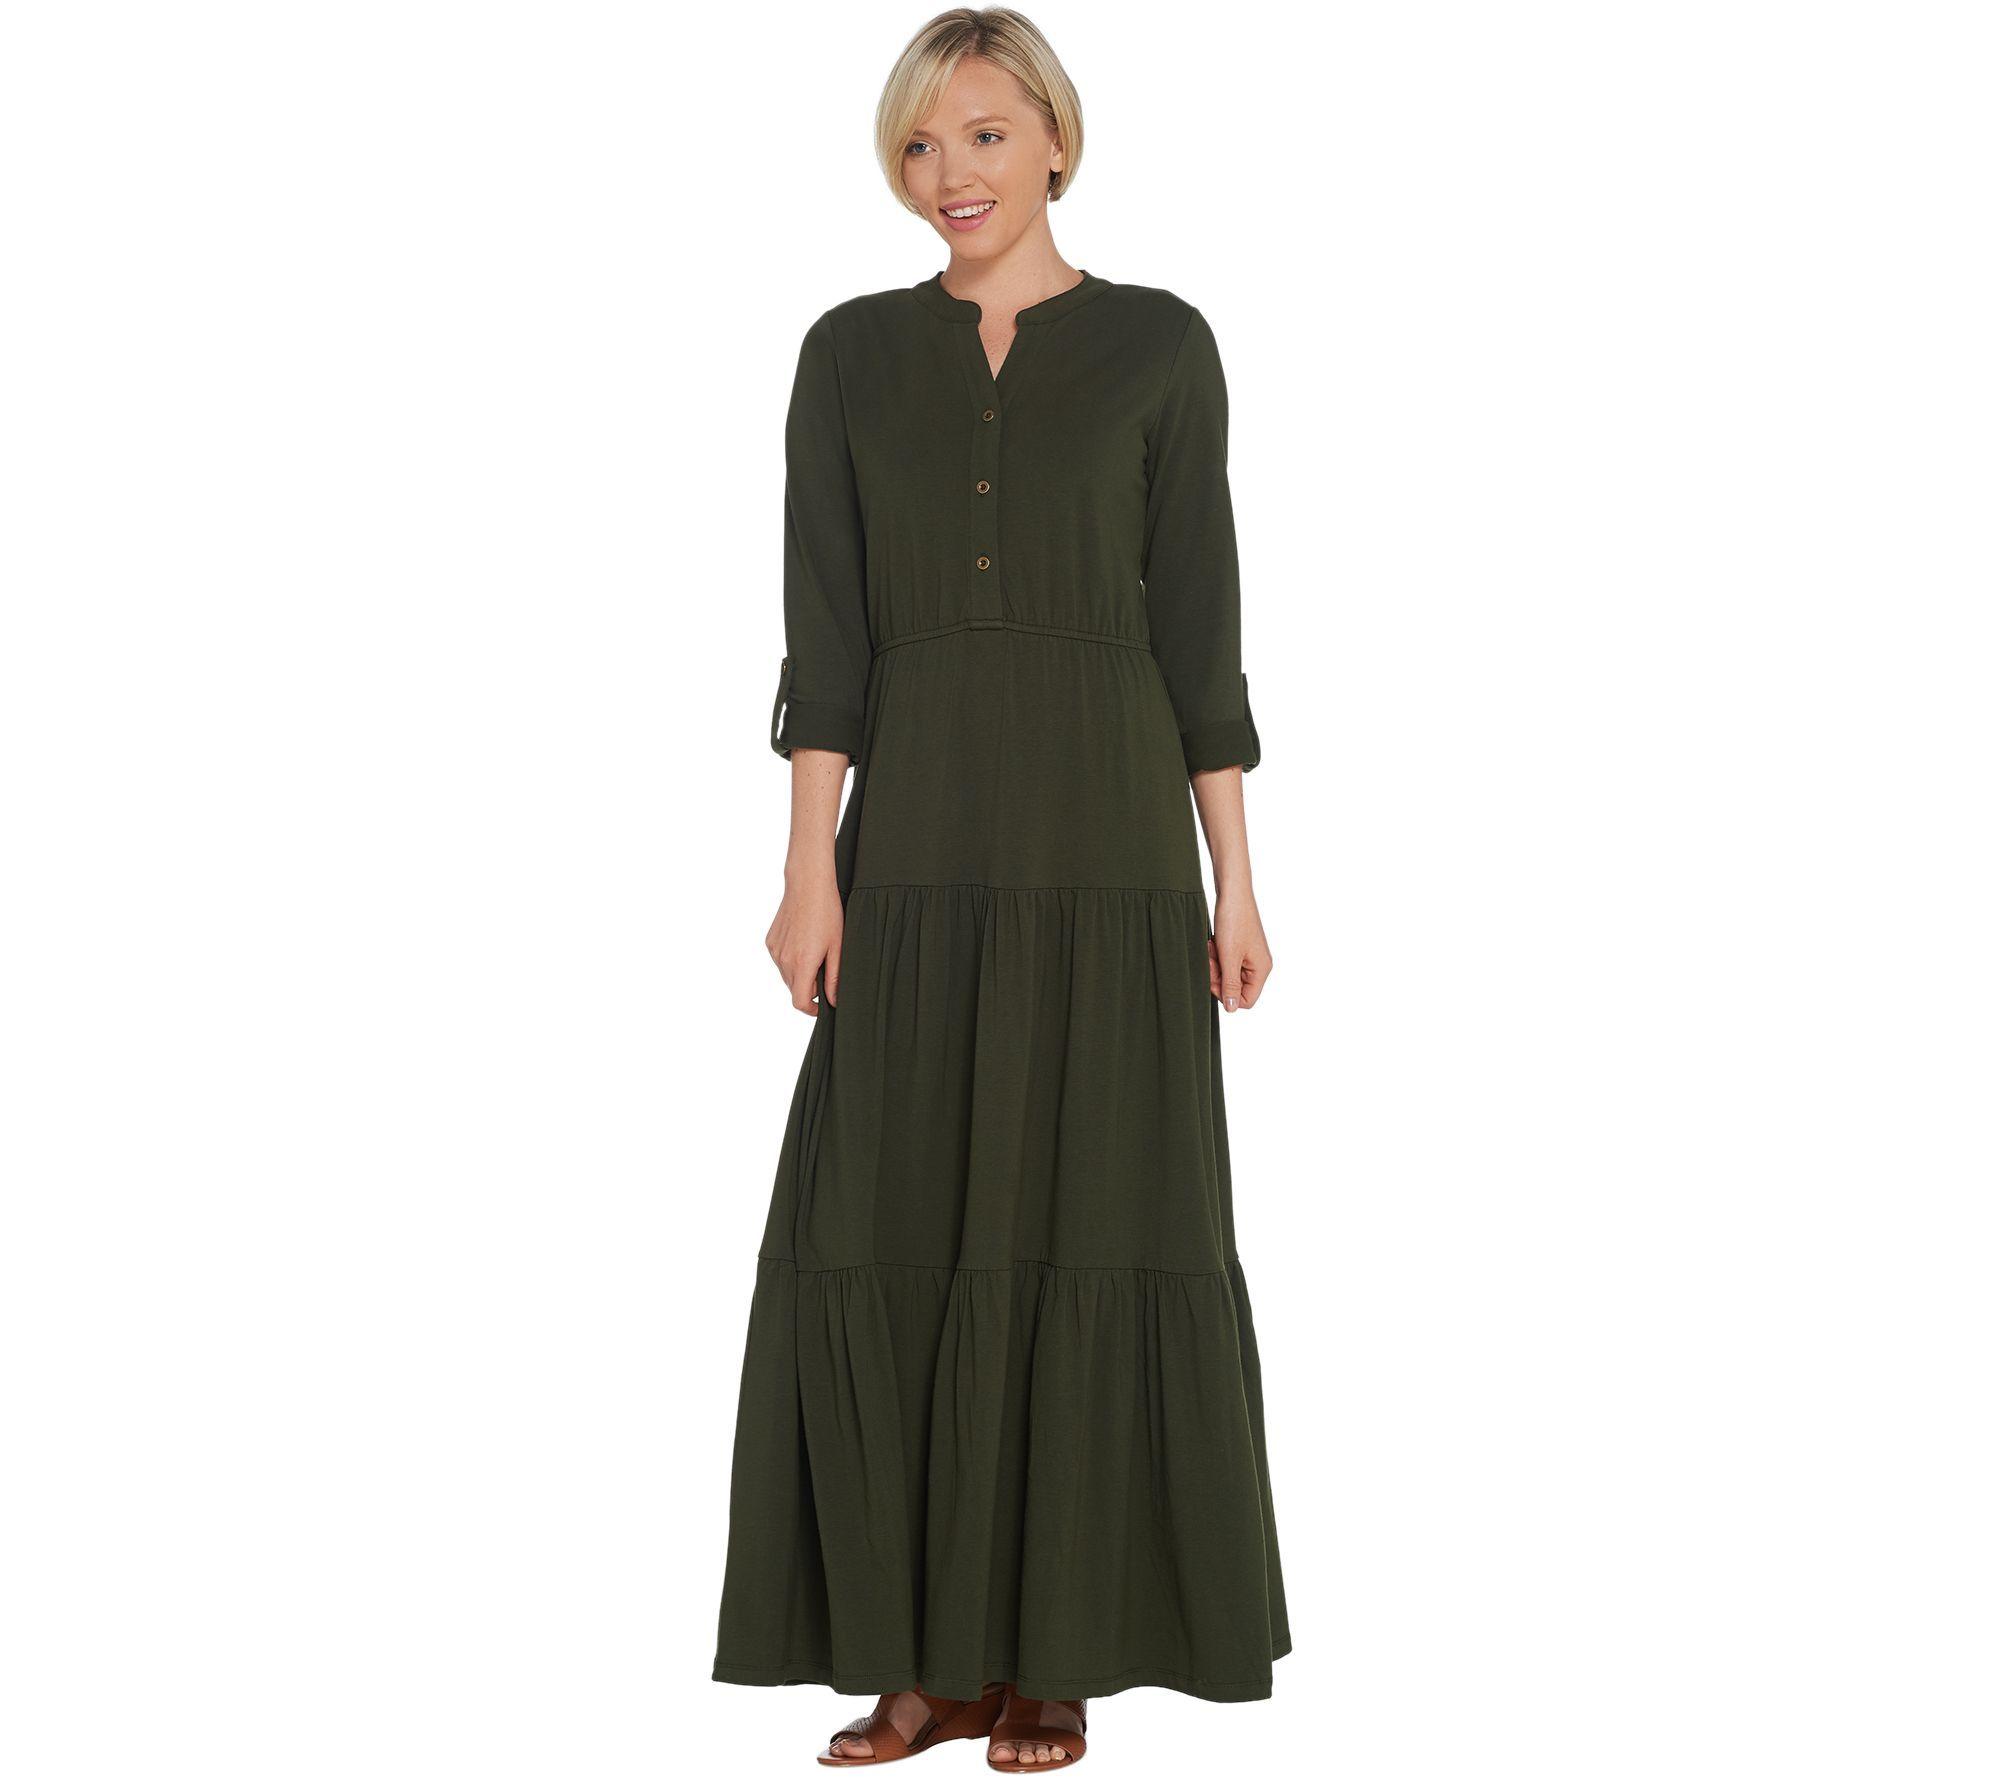 Denim Co Button Y Neck Tiered Maxi Dress W Roll Tab Sleeve Qvc Com Tiered Maxi Dress Maxi Dress Comfy Maxi Dress [ 1778 x 2000 Pixel ]